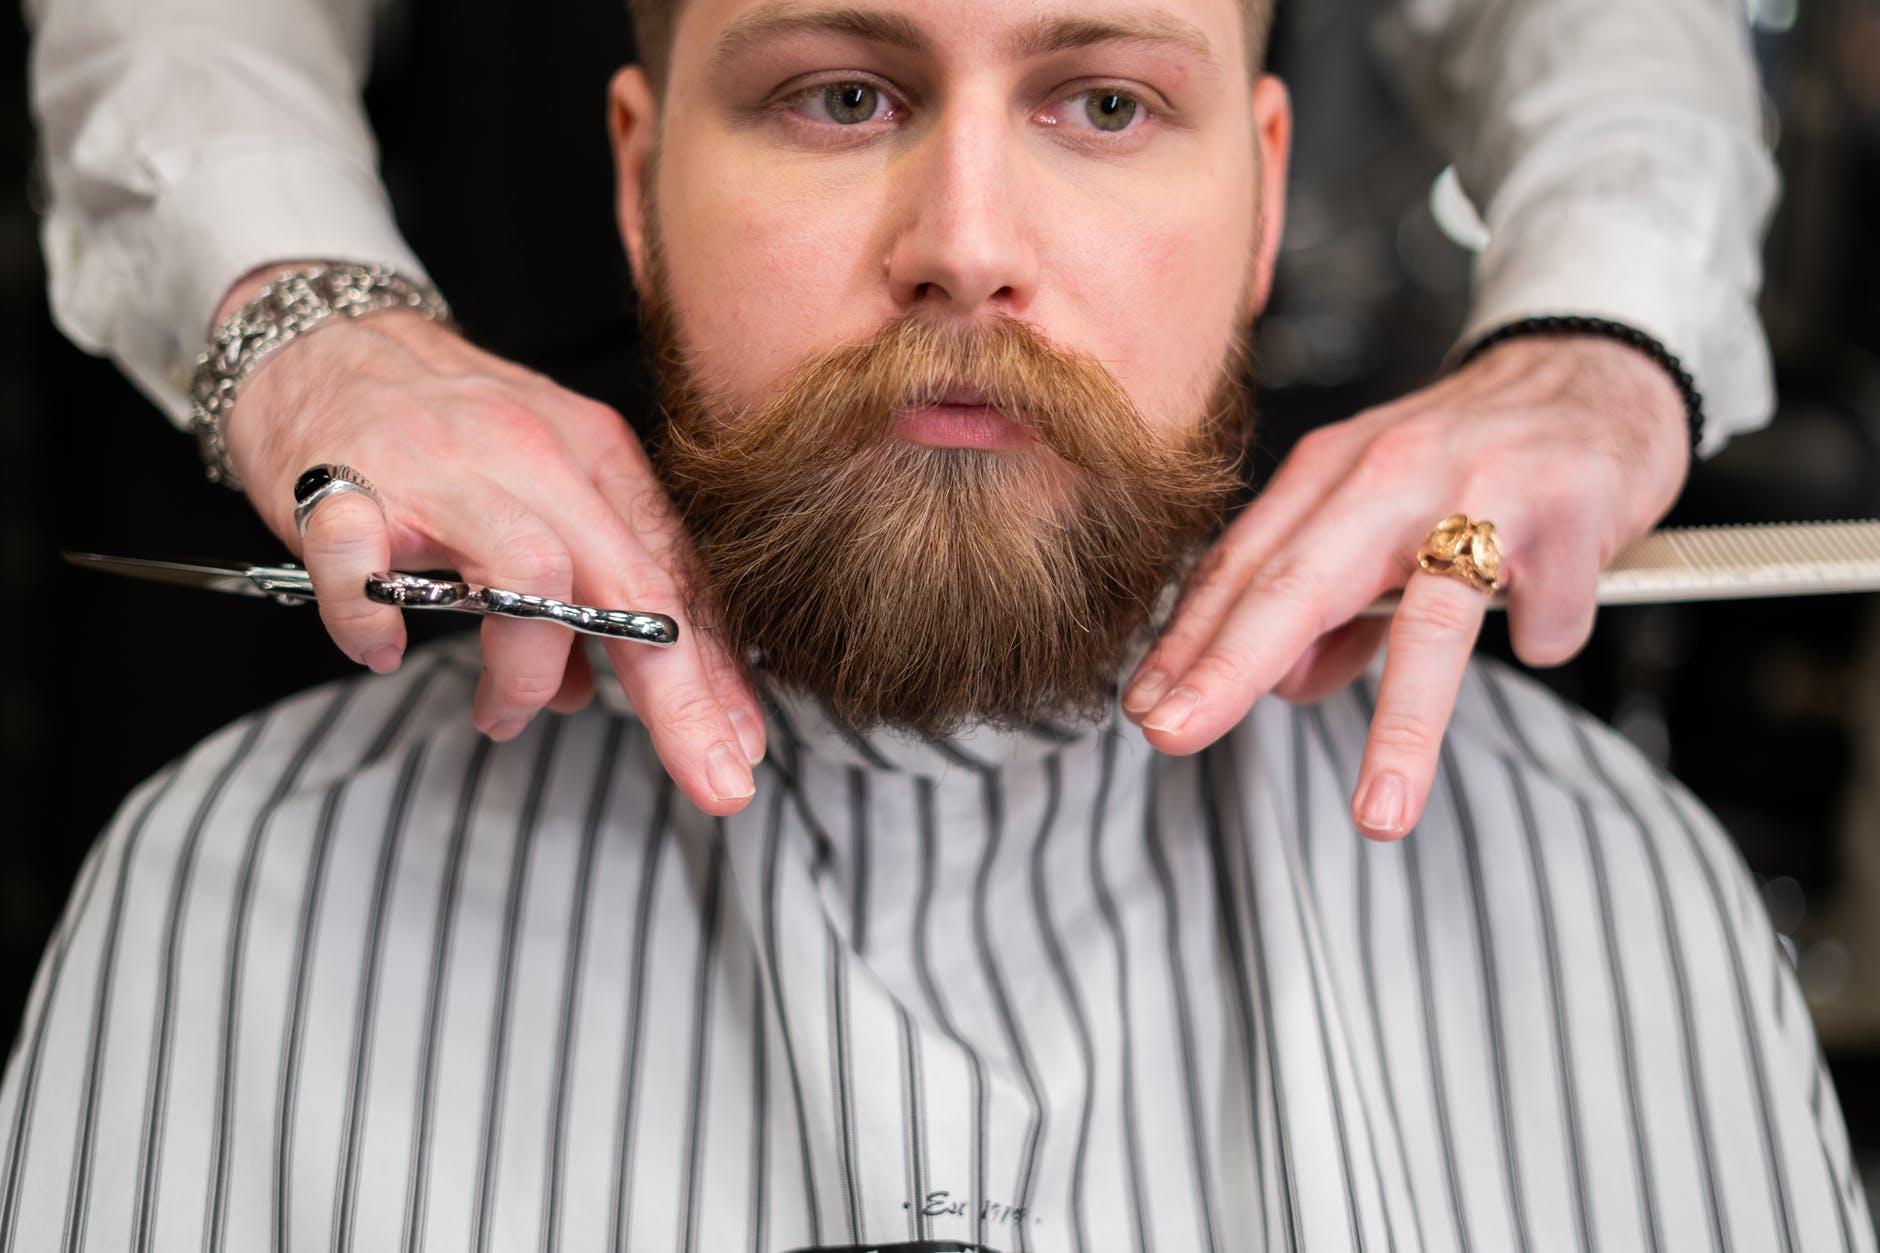 Barbersalon